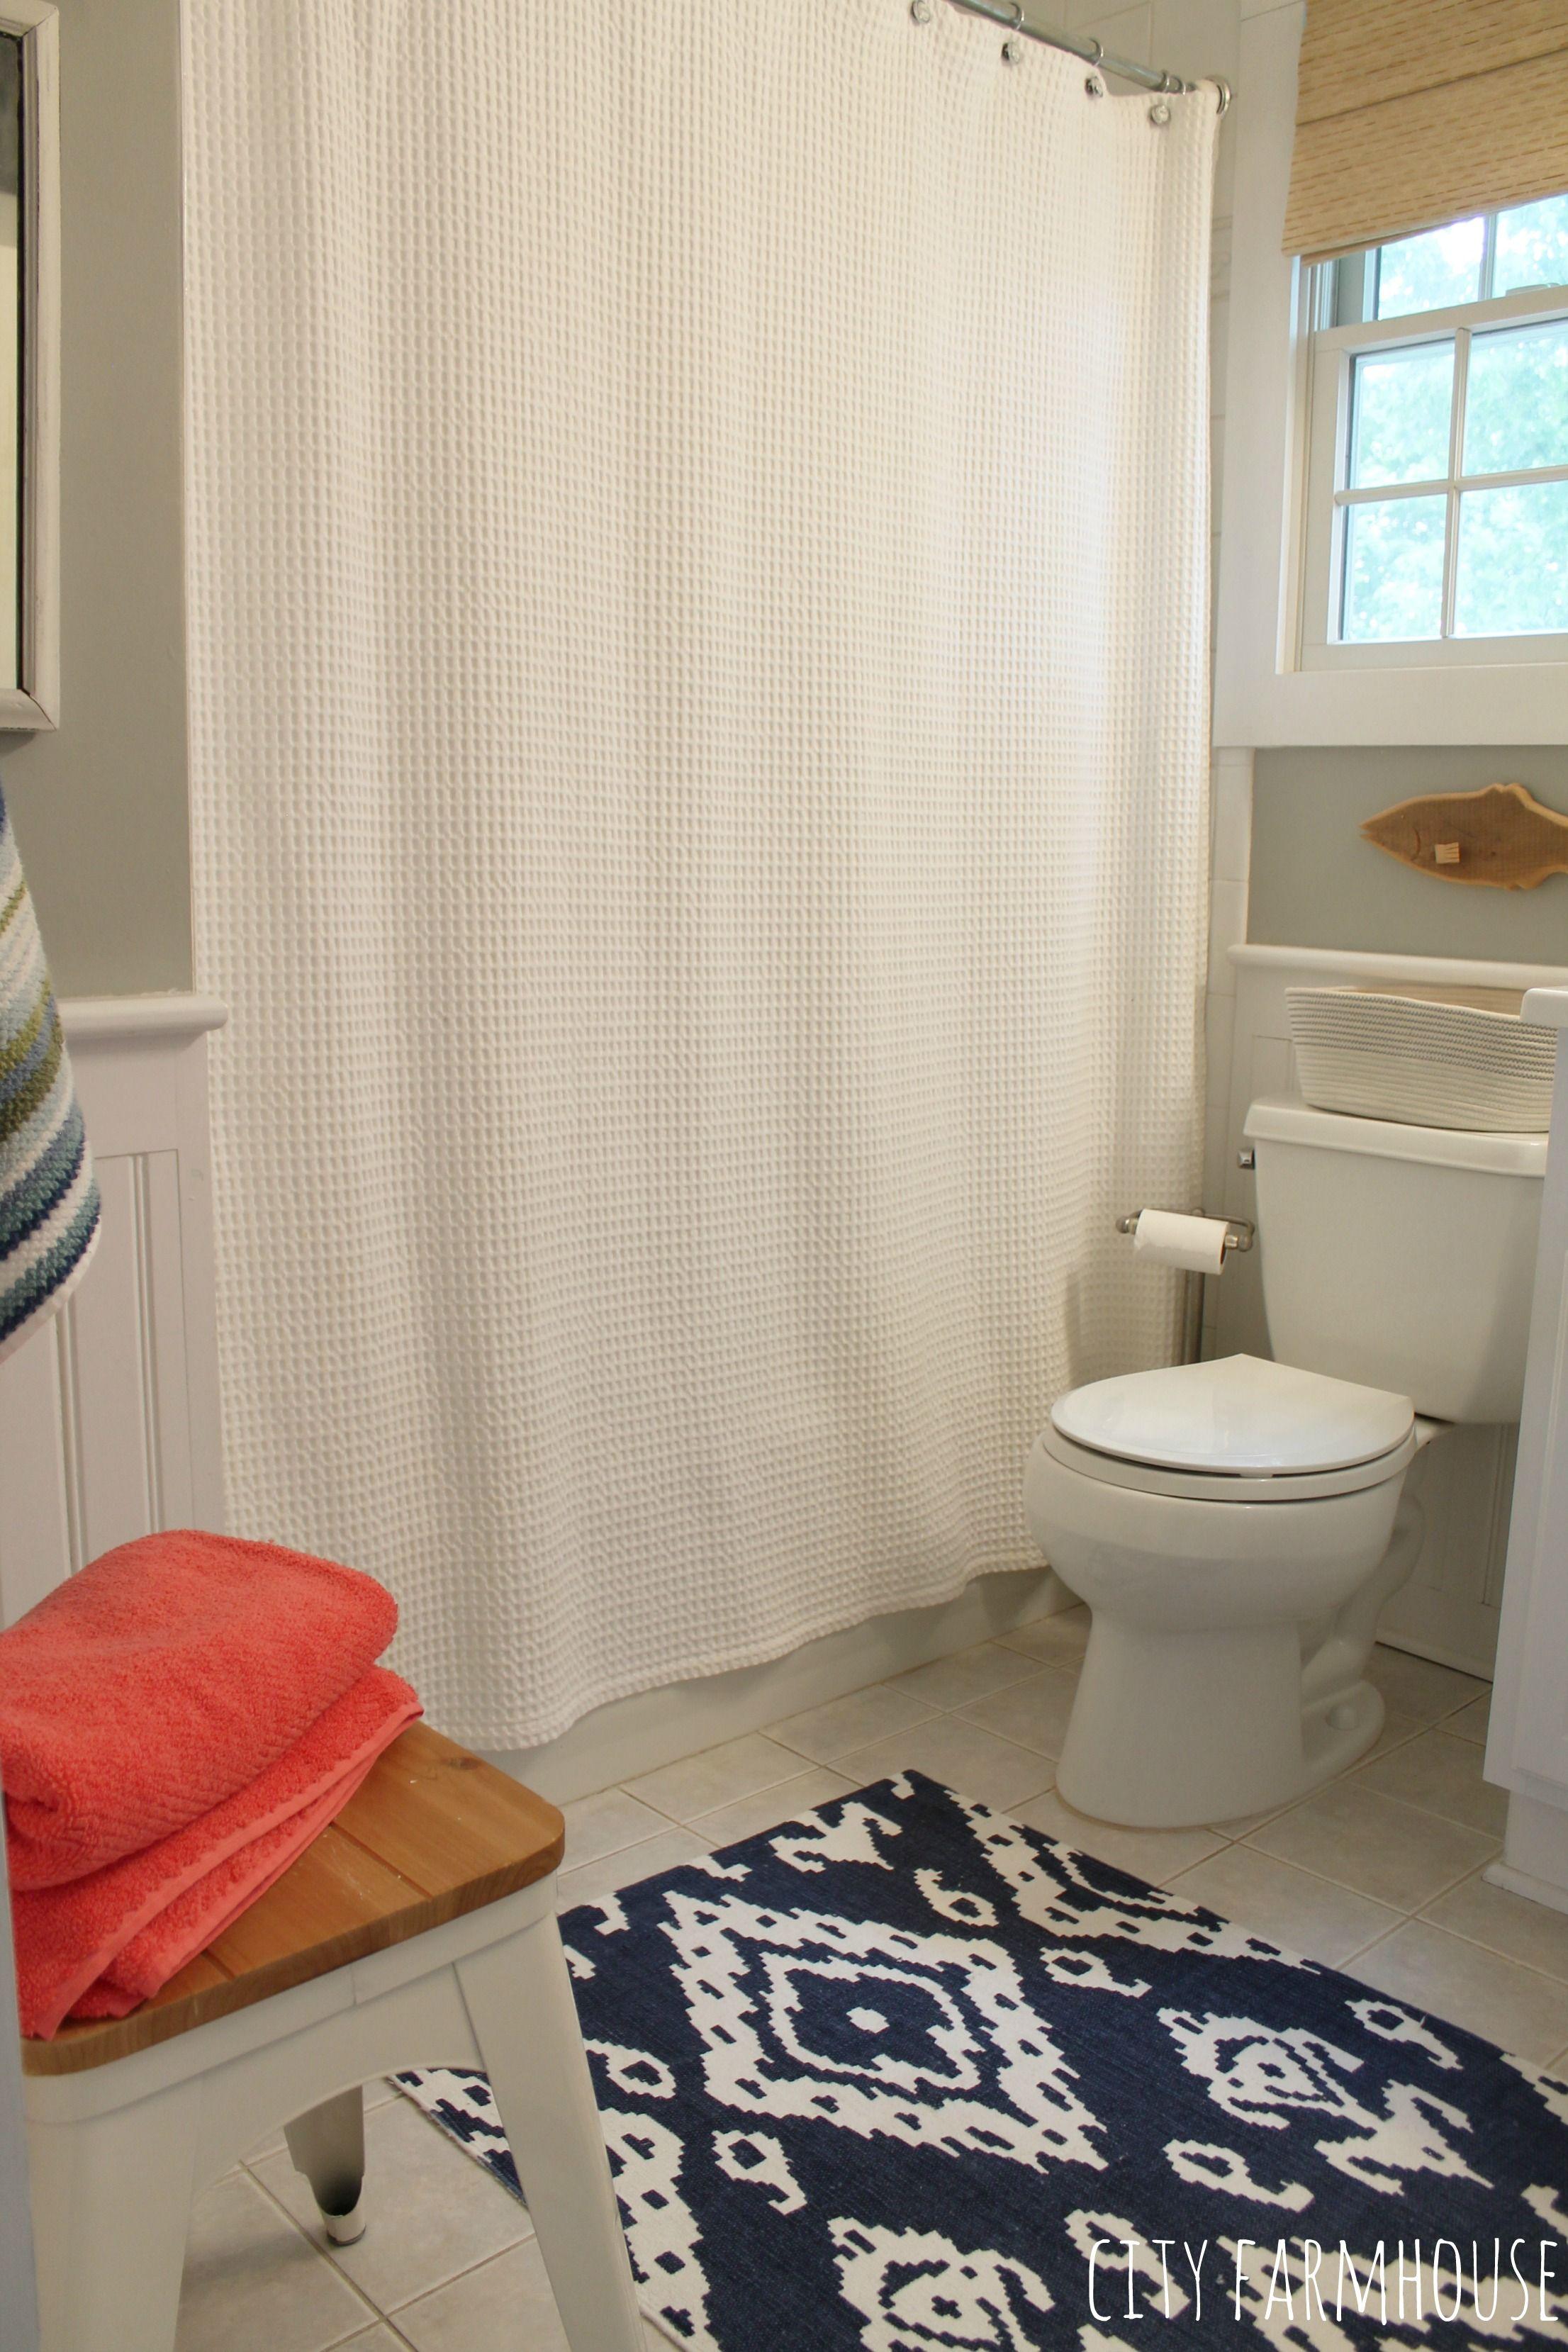 Preppy Coastal Bathroom Makeover Walls Valspar Rope C Navy